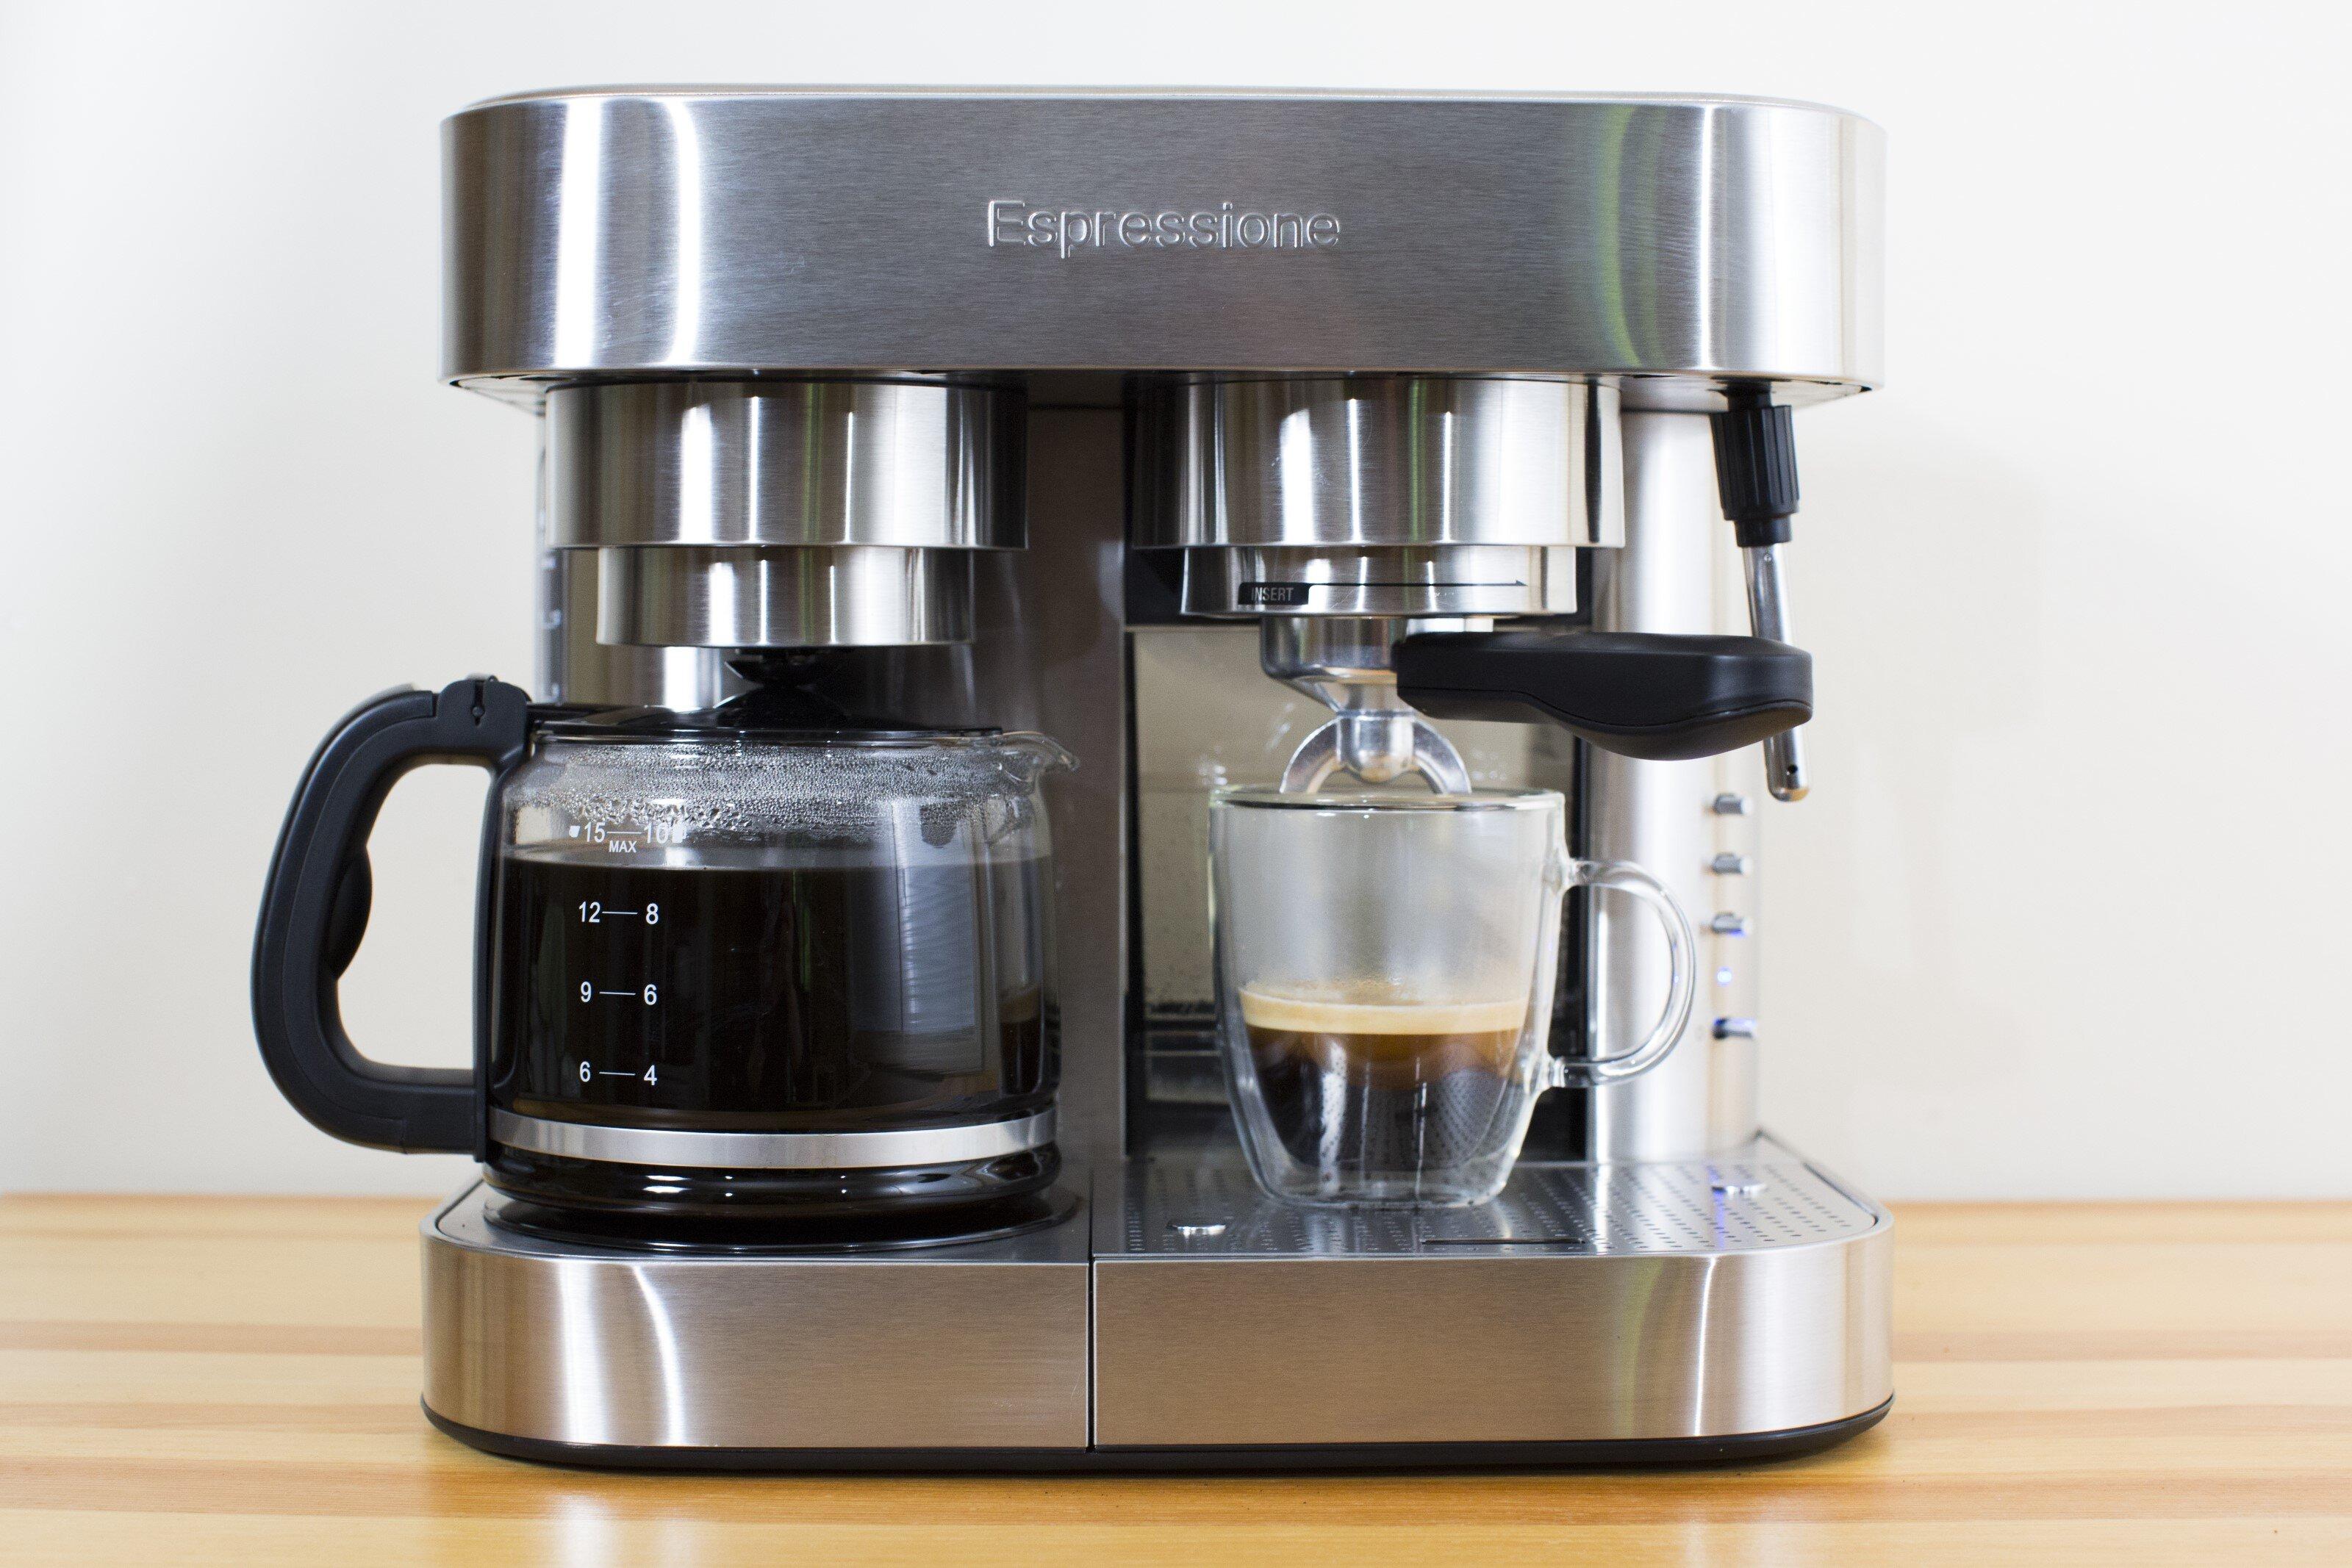 Espressione Stainless Steel Combination Coffee Espresso Maker Reviews Wayfair